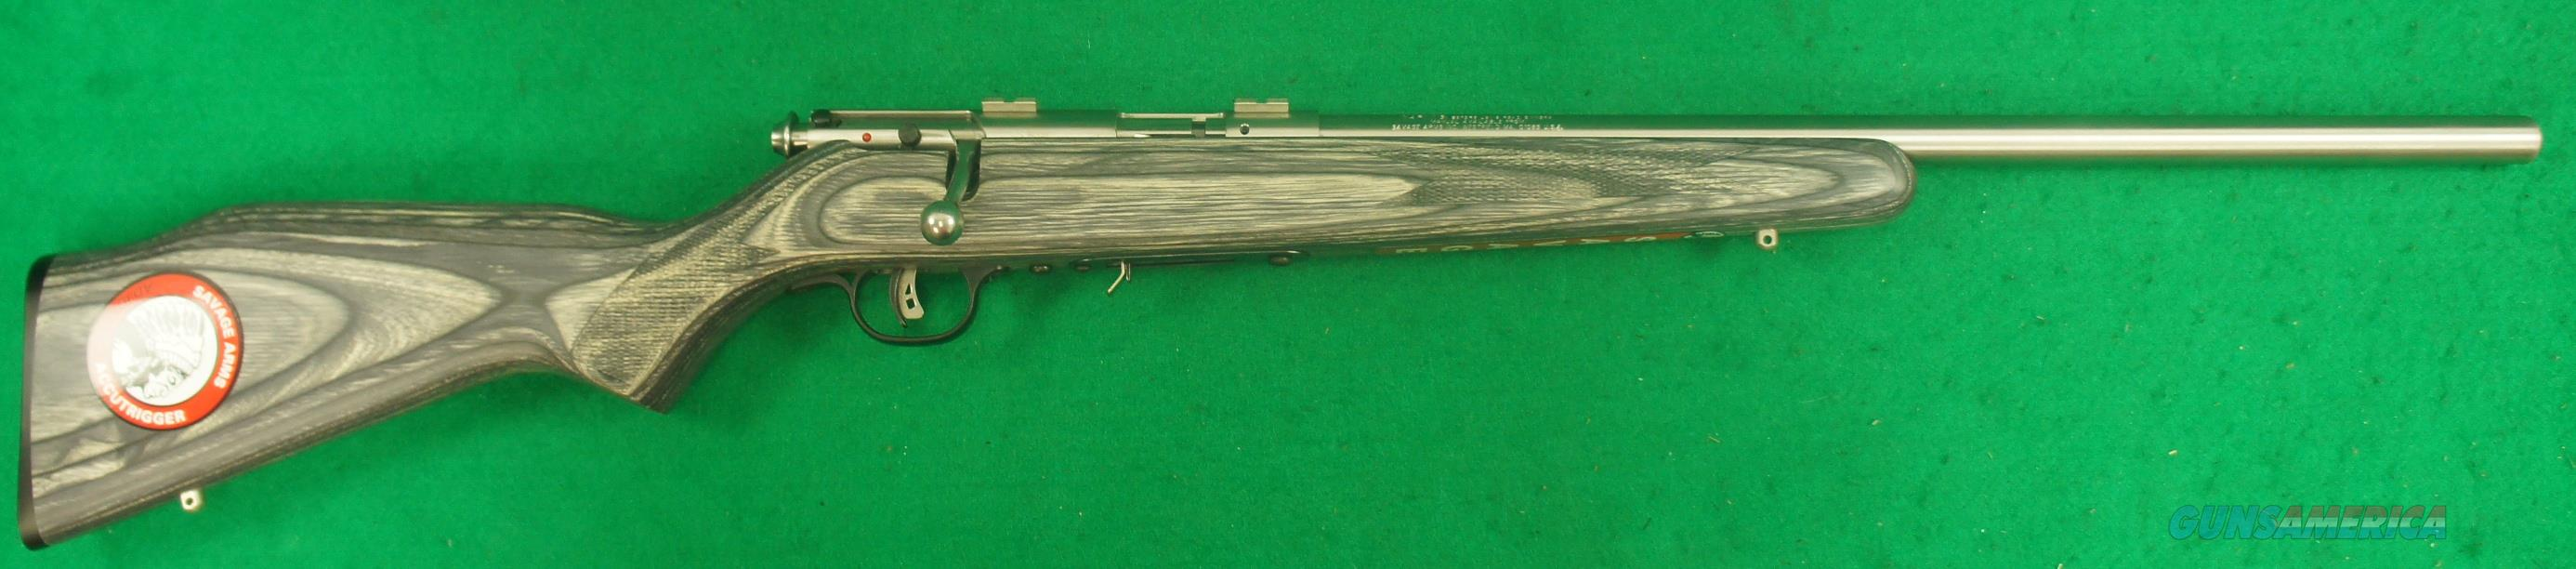 93 BVSS Lam HBar SS 17HMR 21In  96705  Guns > Rifles > Savage Rifles > Accutrigger Models > Sporting